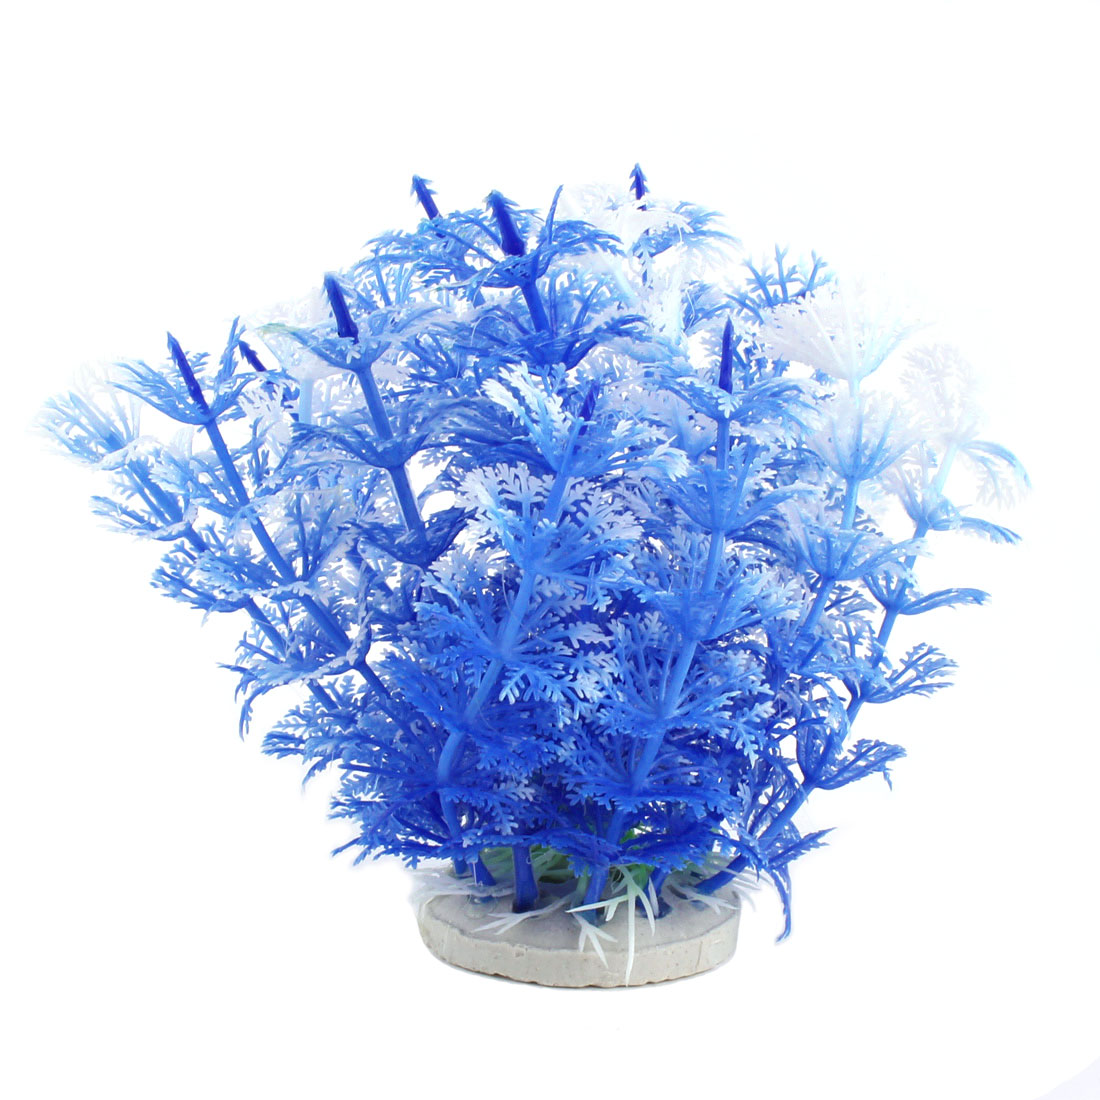 Fish Tank Aquarium Plastic Simulation Vivid Artificial Plant Ornament Decoration